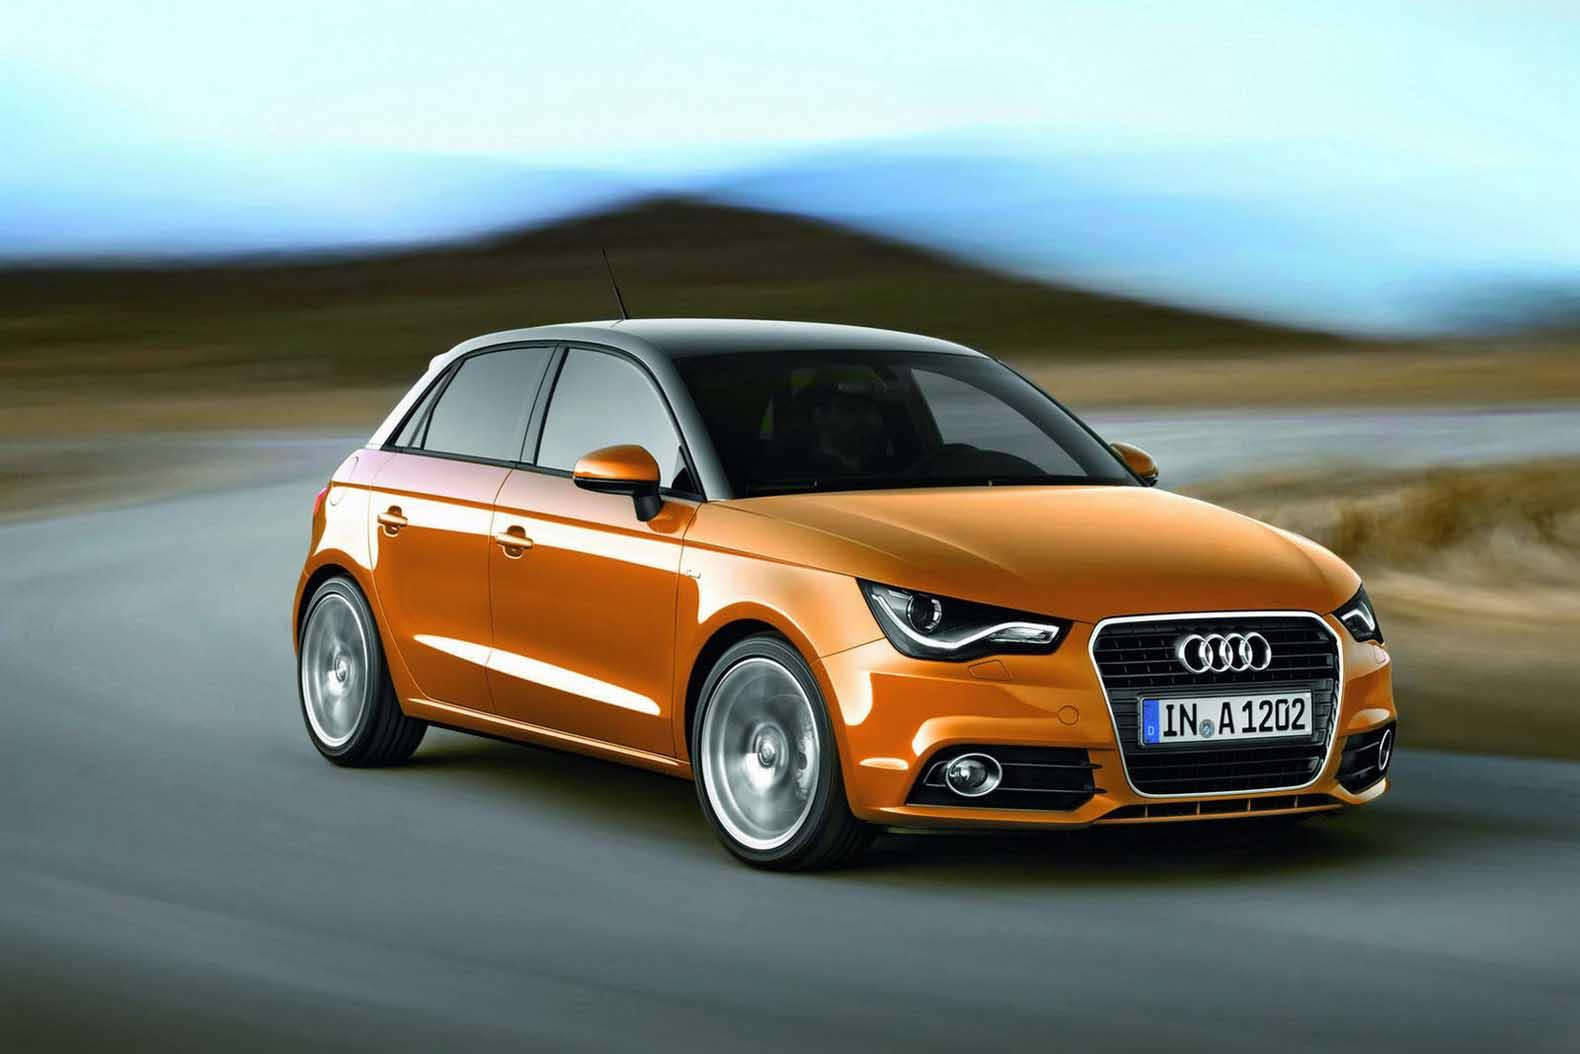 Photo of Audi A1 Sportback [new model + video]